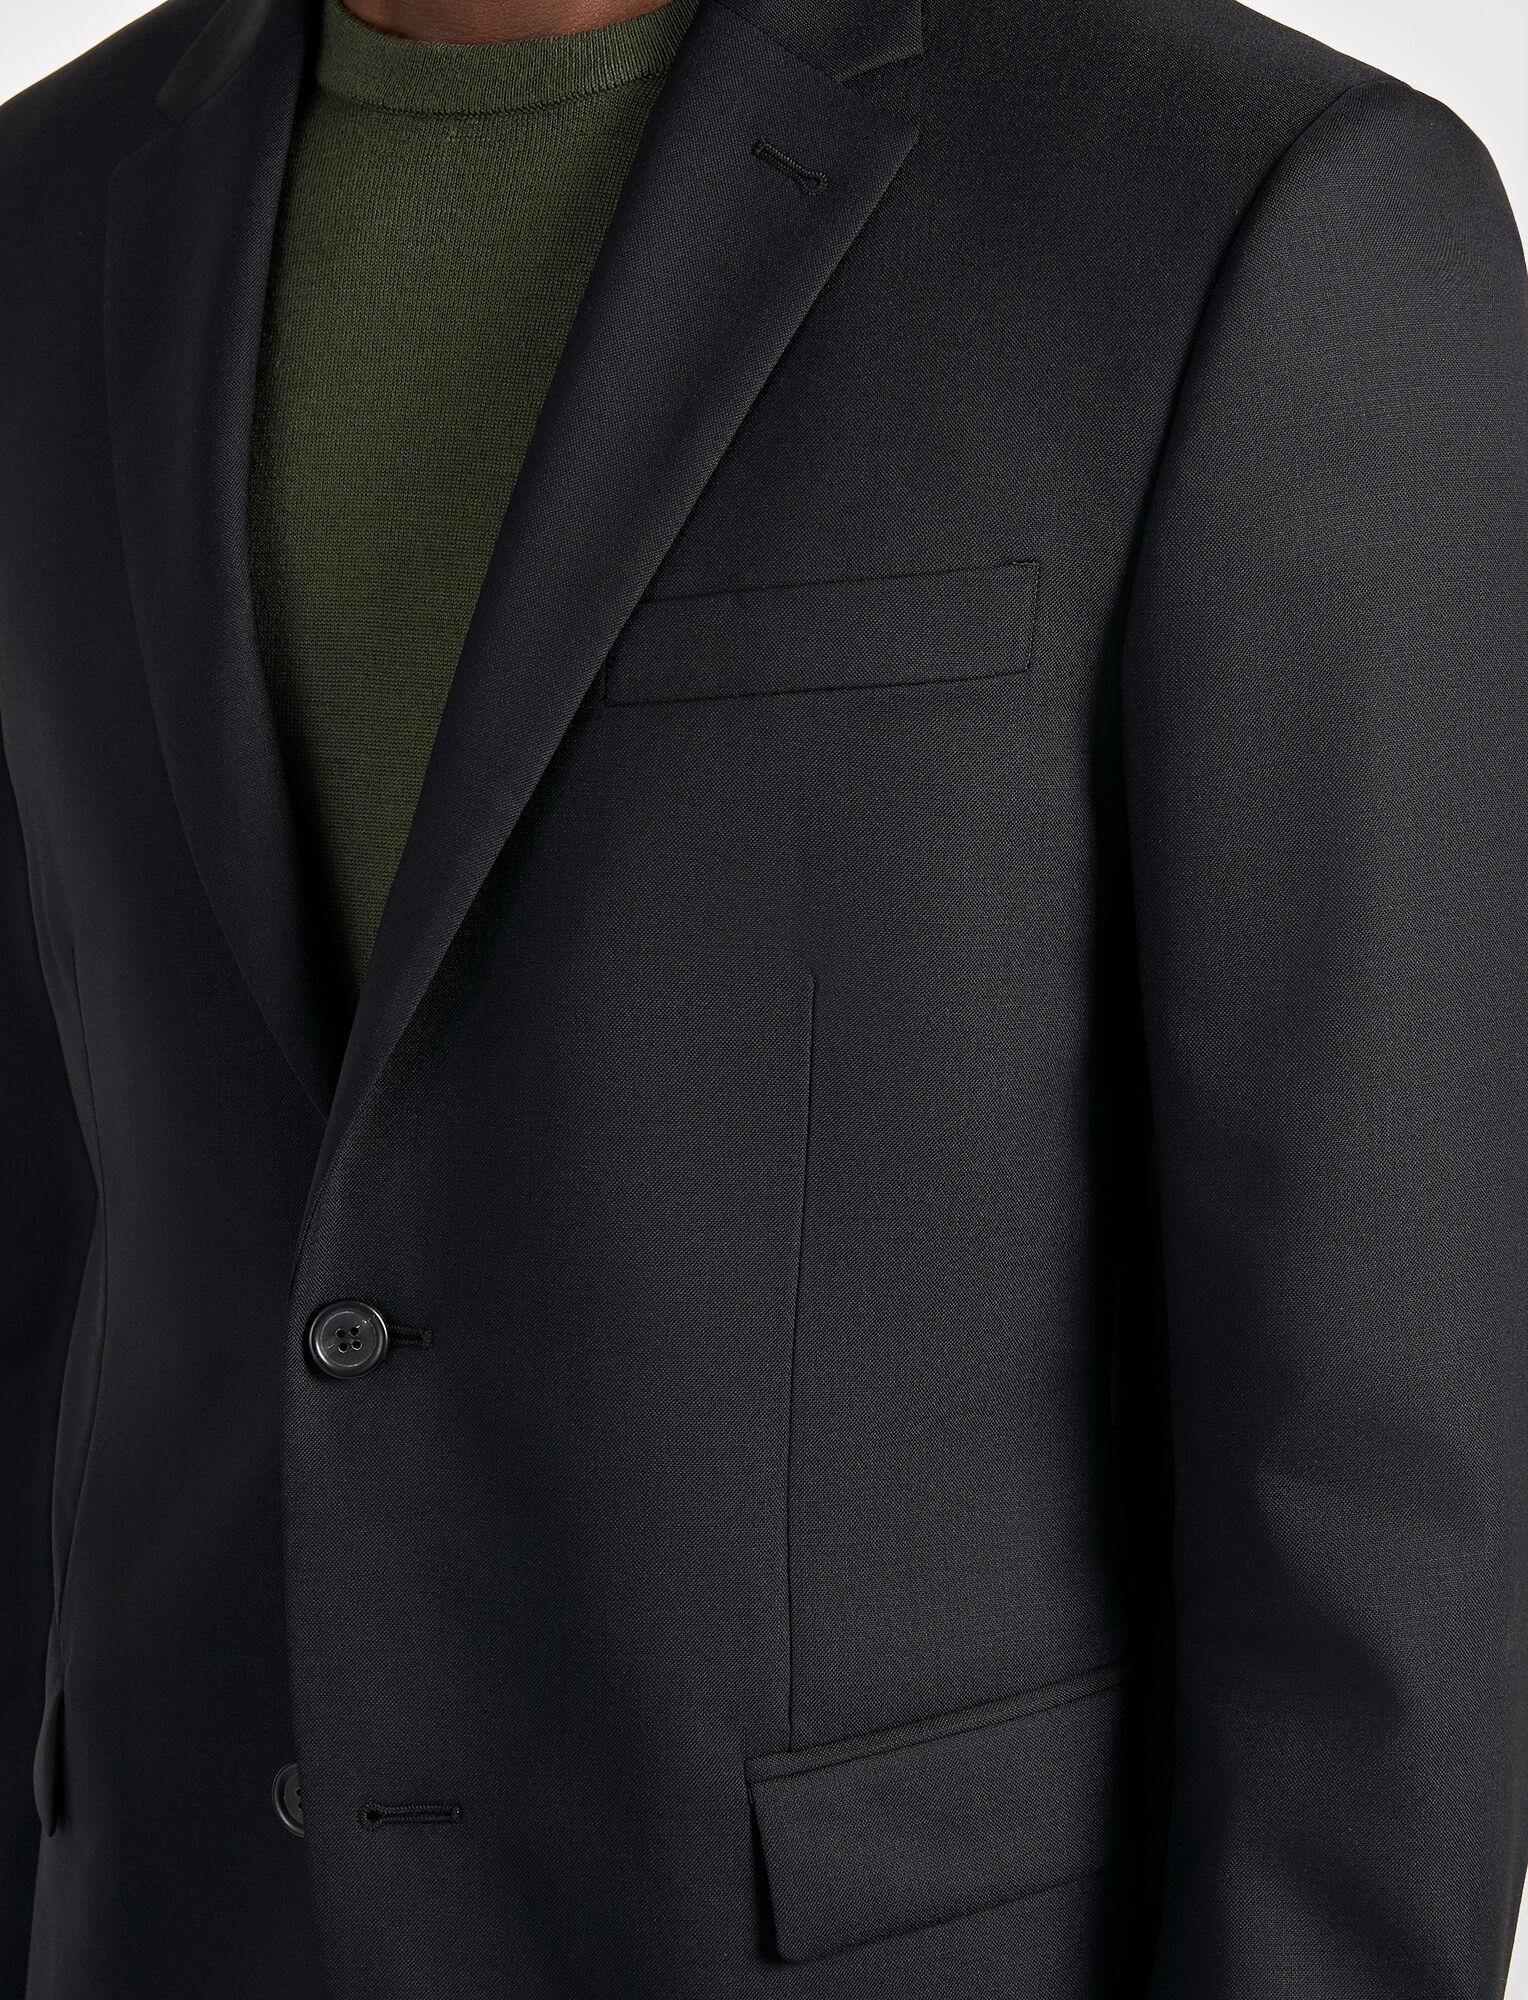 Joseph, Tropical Wool Davide Suit Jacket, in BLACK